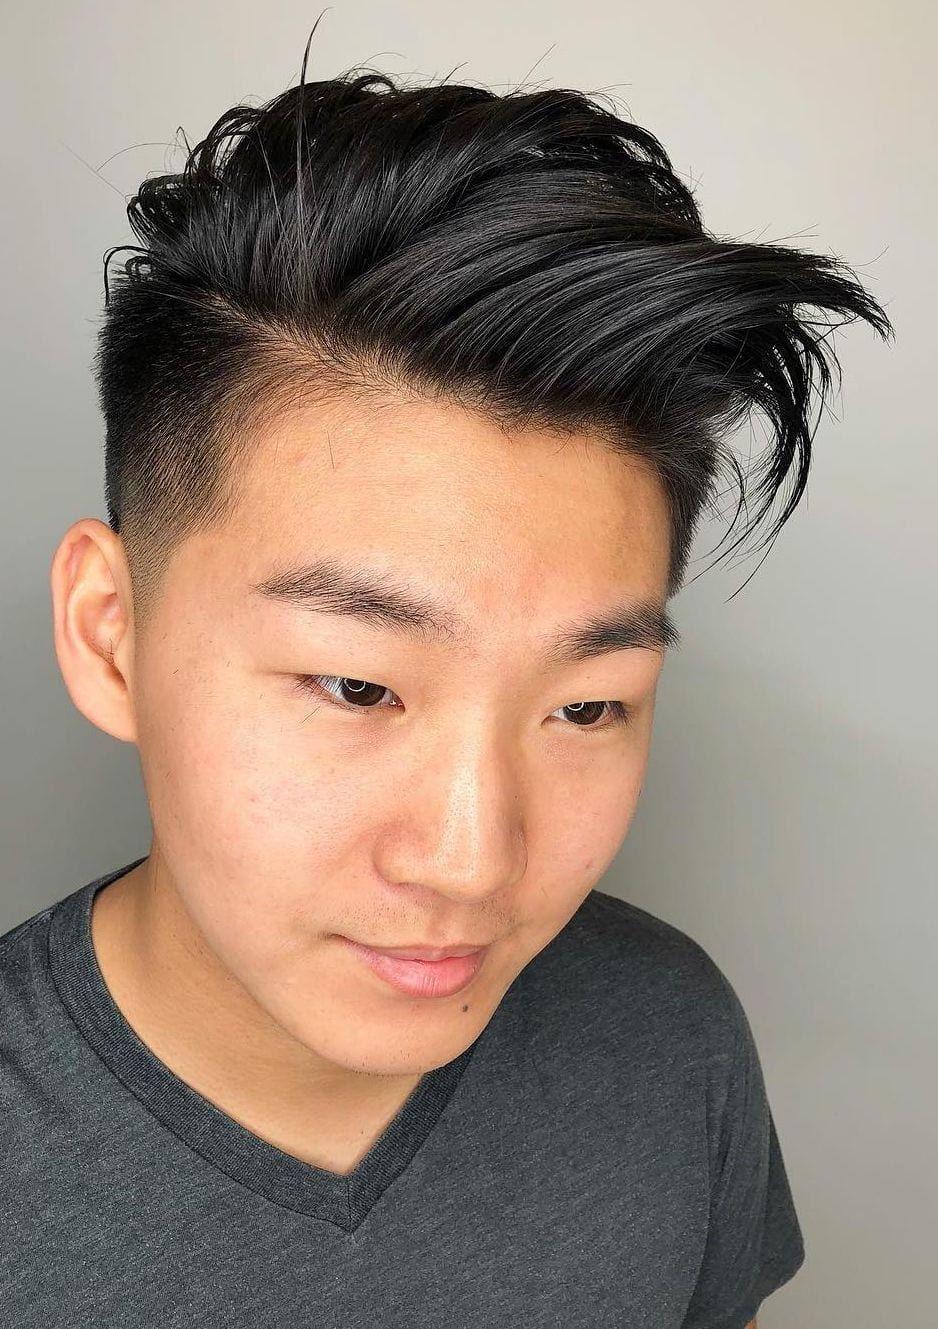 Top 30 Trendy Asian Men Hairstyles 2020 Asian Hair Asian Men Hairstyle Side Swept Hairstyles